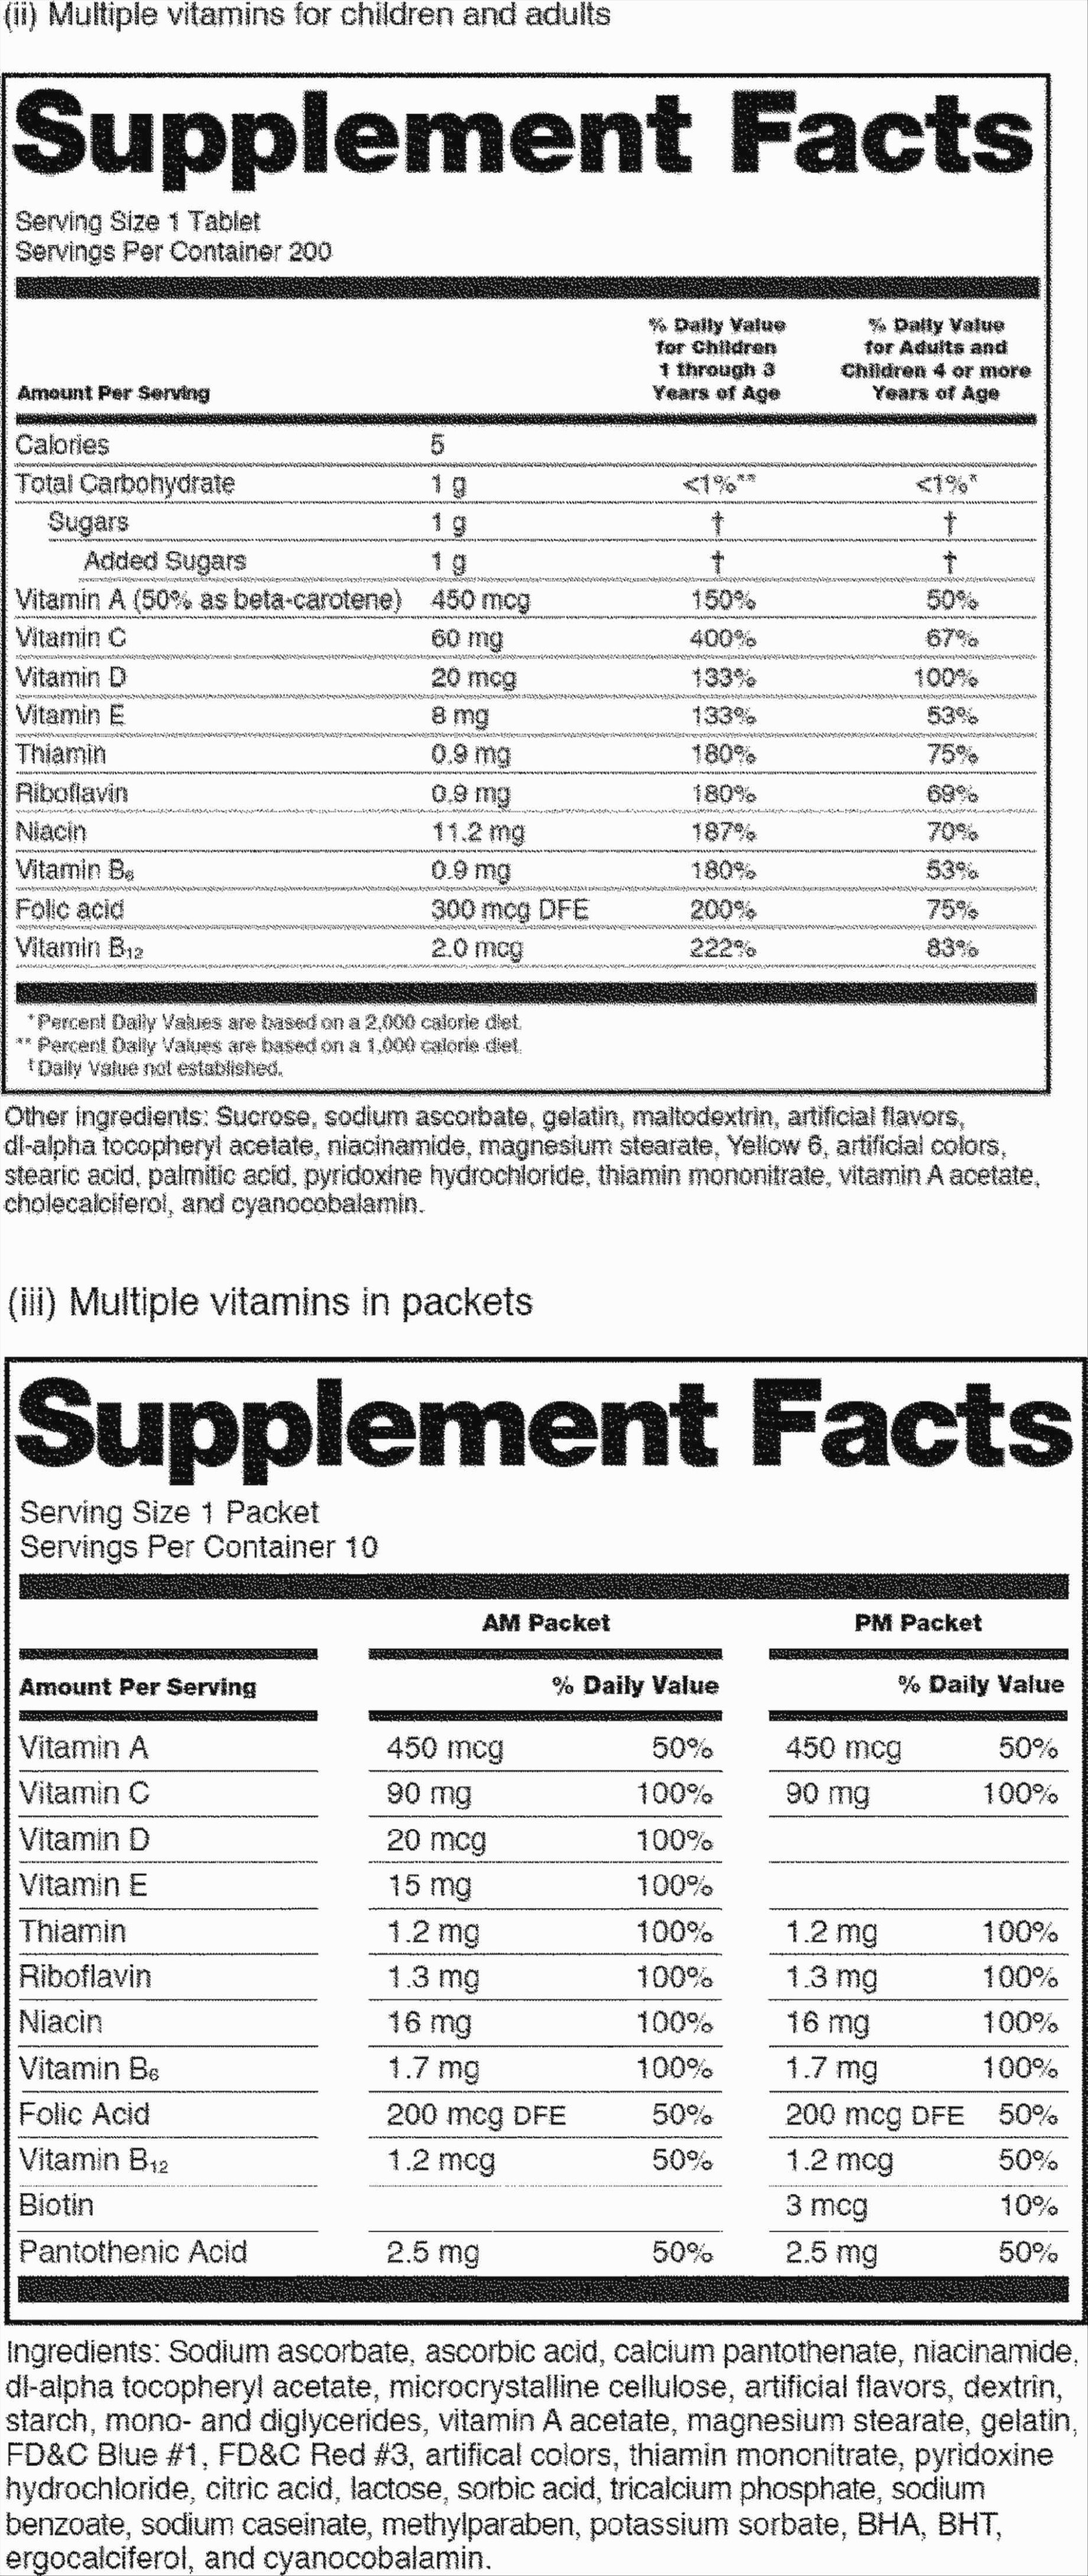 Blank Nutrition Label Worksheet Lovely Seven Secrets About Blank